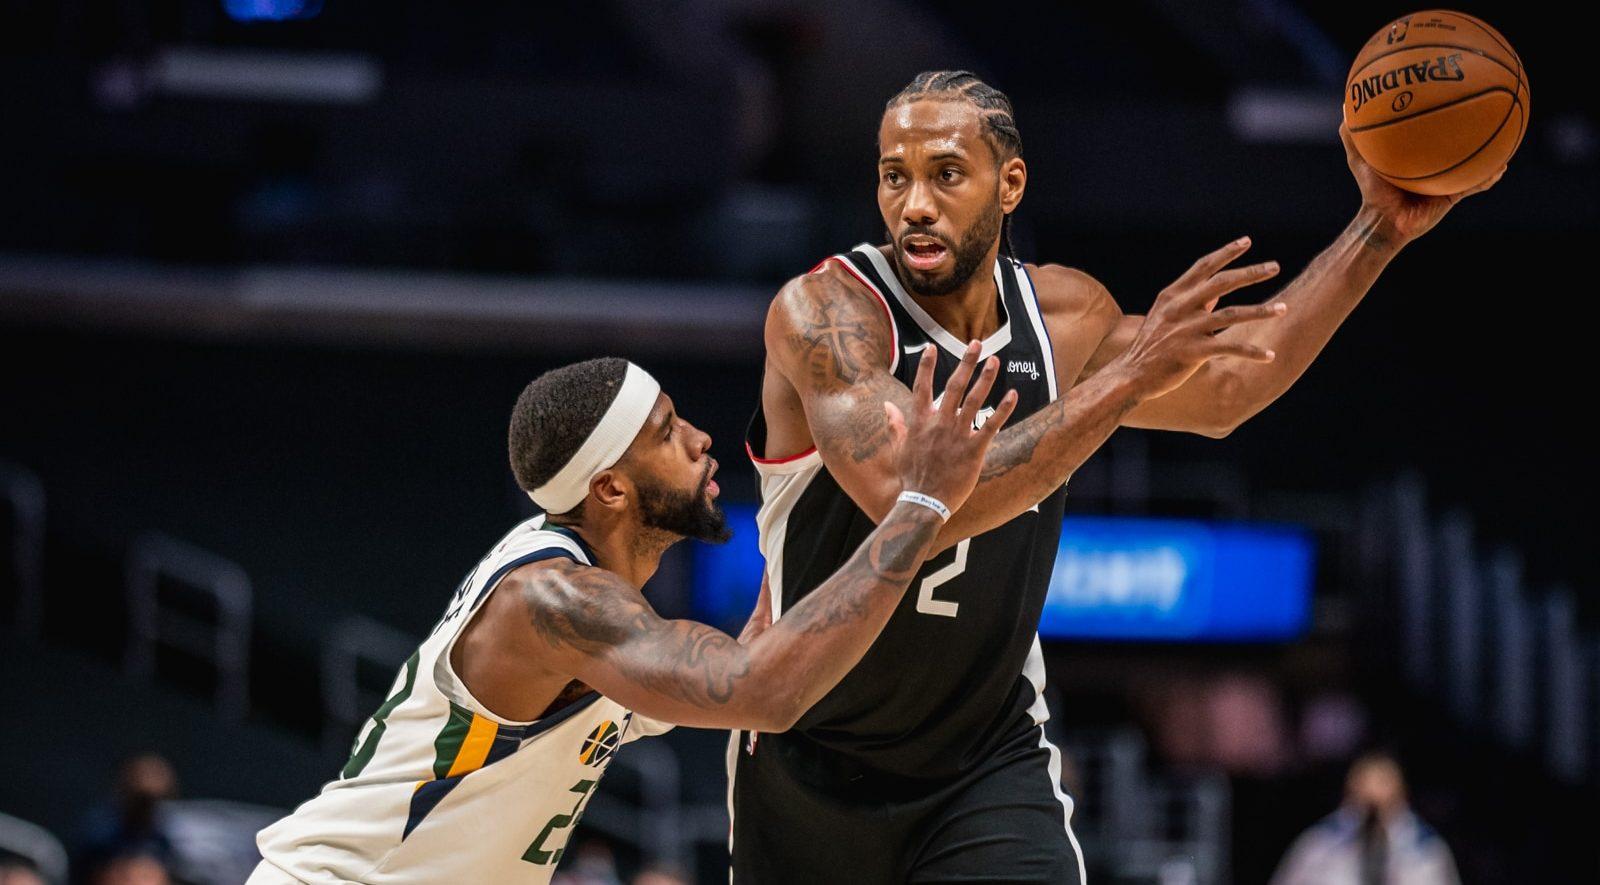 Clippers vs. Jazz Game 1 Recap: Worn Clips Fall Short